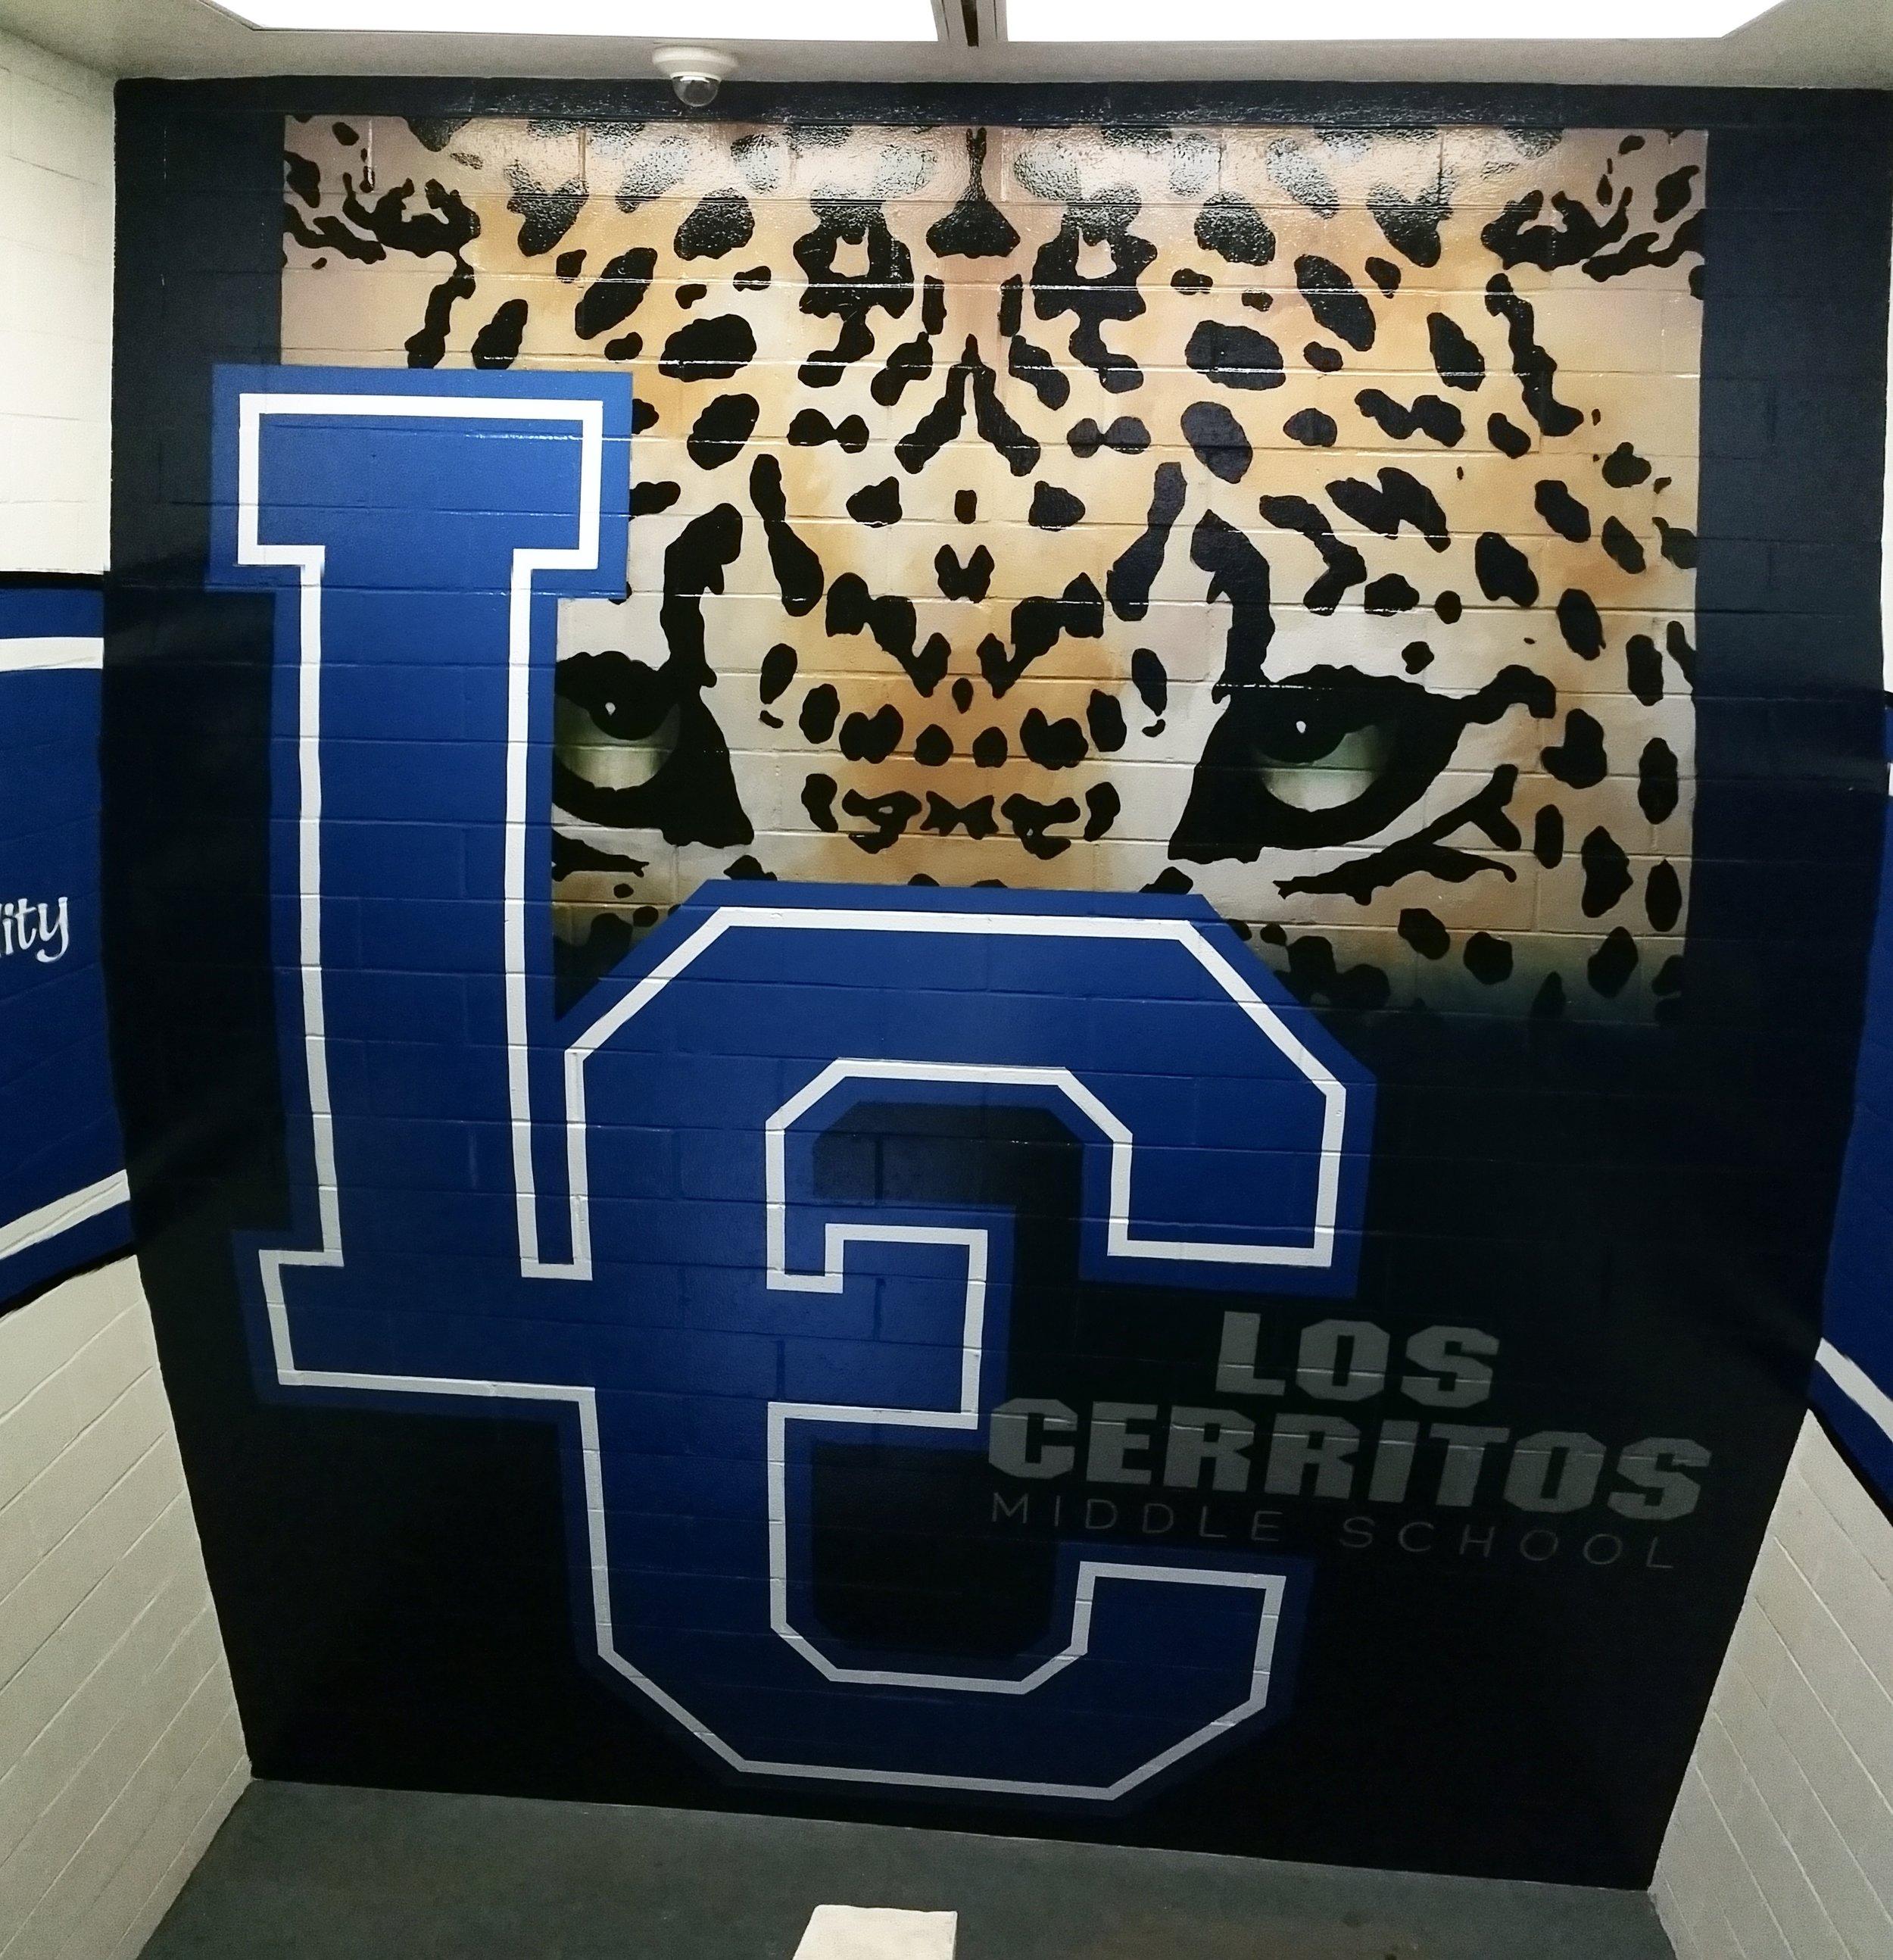 Los Cerritos Middle School hand painted mural